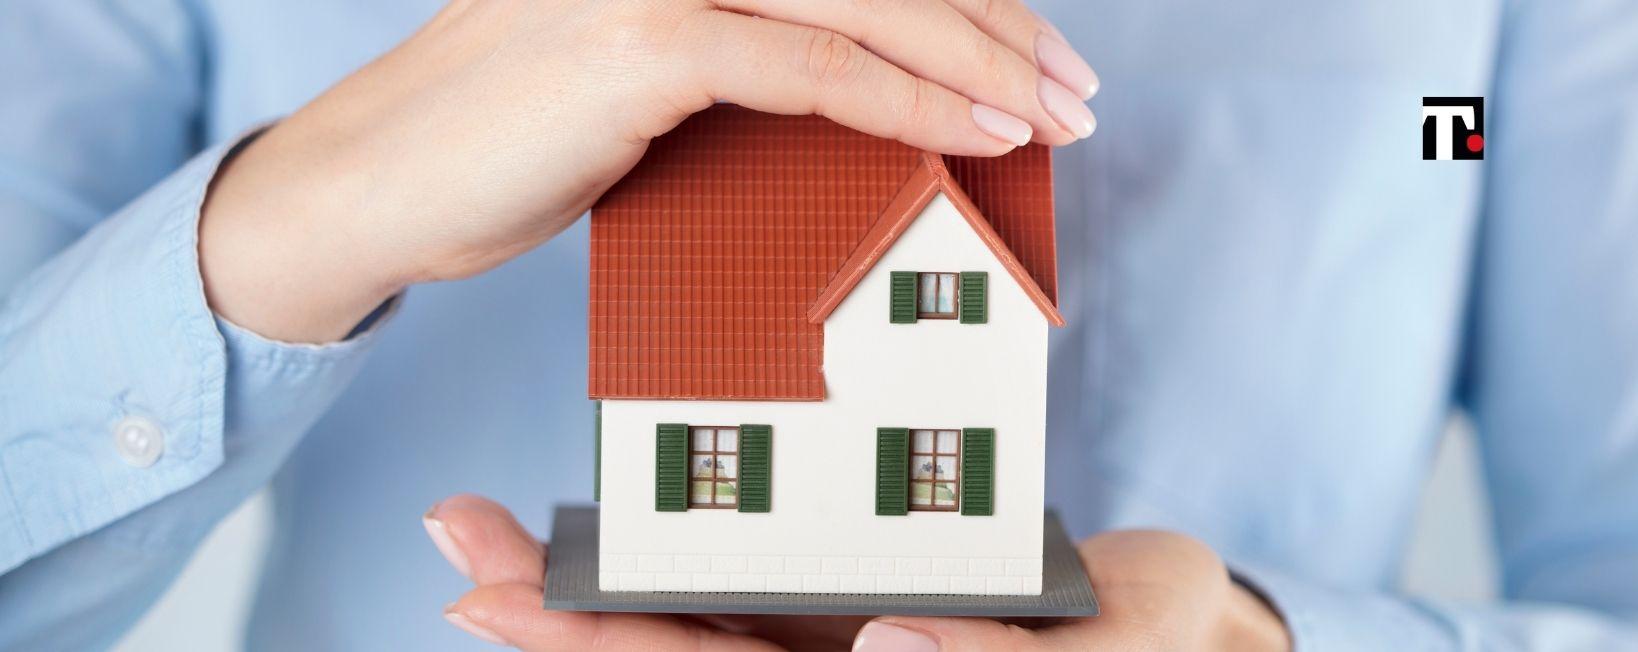 Mutui casa under 35